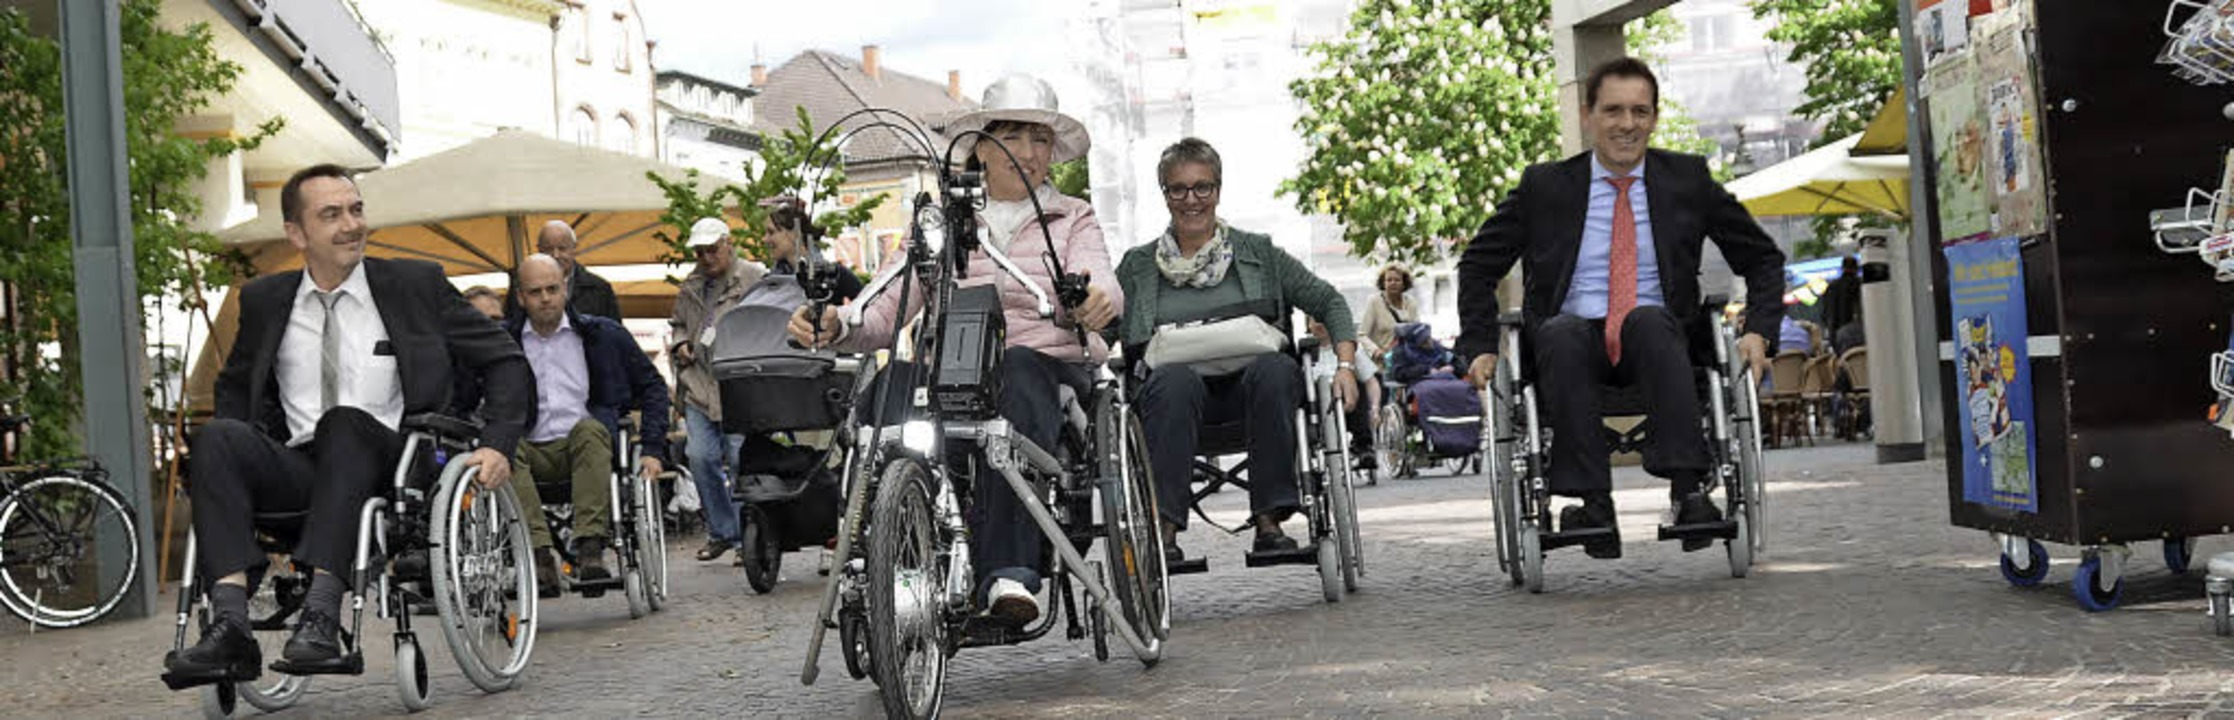 Kein Rollstuhlrennen, hier erfahren St... Krämer, Oberbürgermeister Jörg Lutz.   | Foto: Nikolaus Trenz